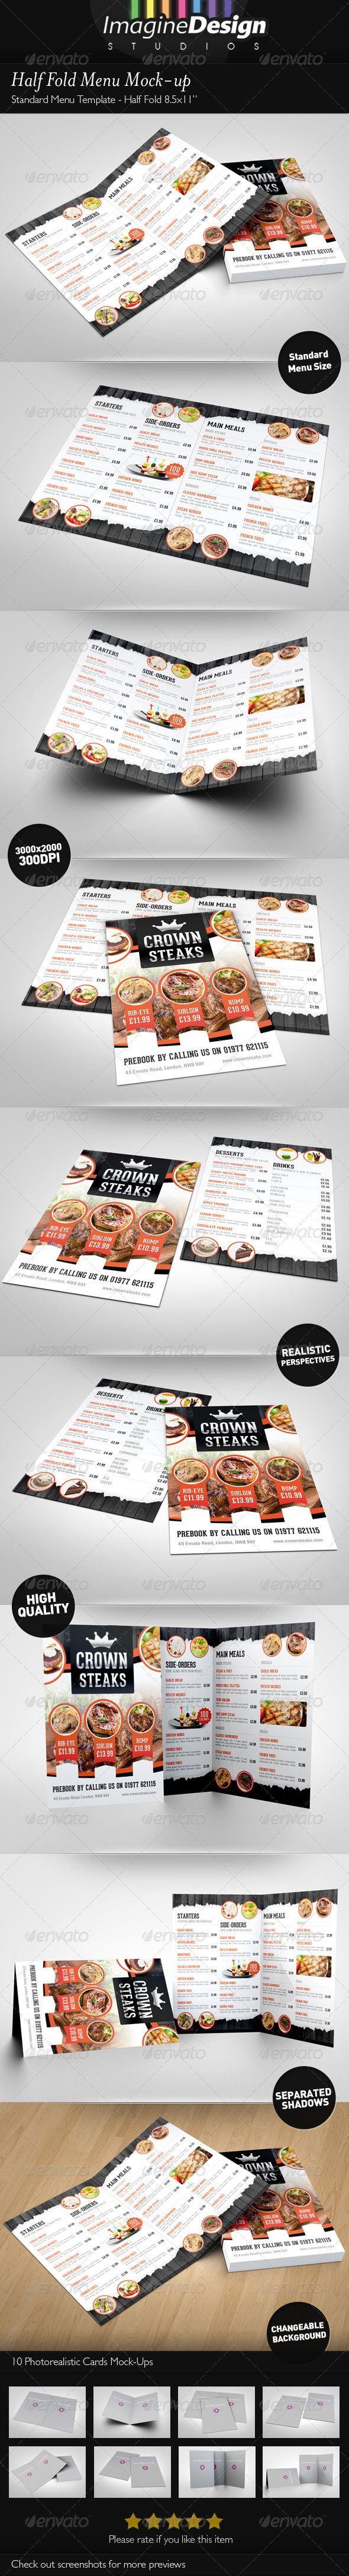 Half Fold Menu Mock-up Download here: https://graphicriver.net/item/half-fold-menu-mockup/3497213?ref=KlitVogli